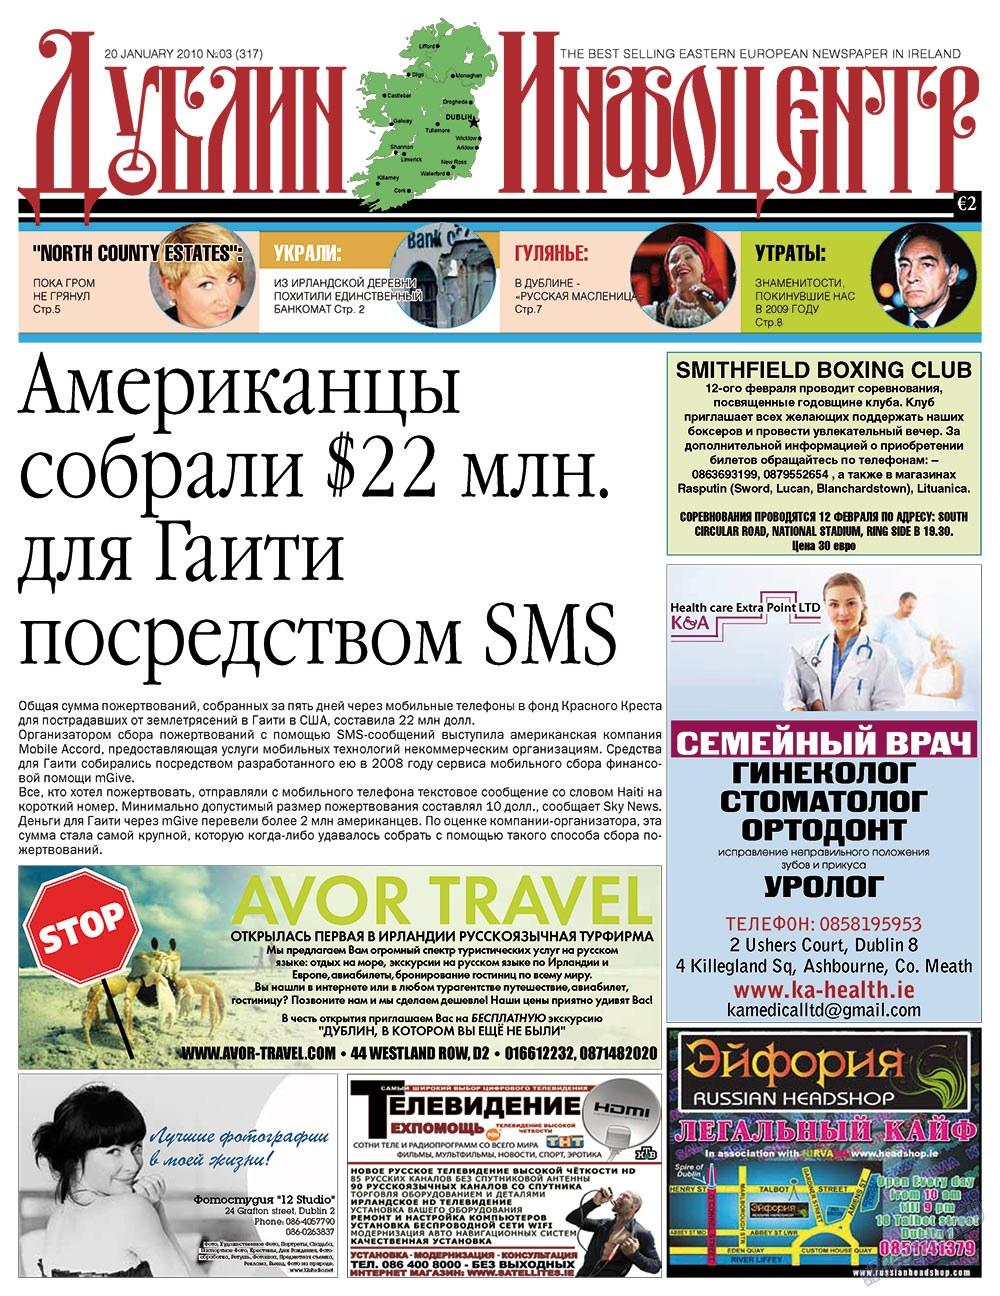 Дублин инфоцентр (газета). 2010 год, номер 3, стр. 1